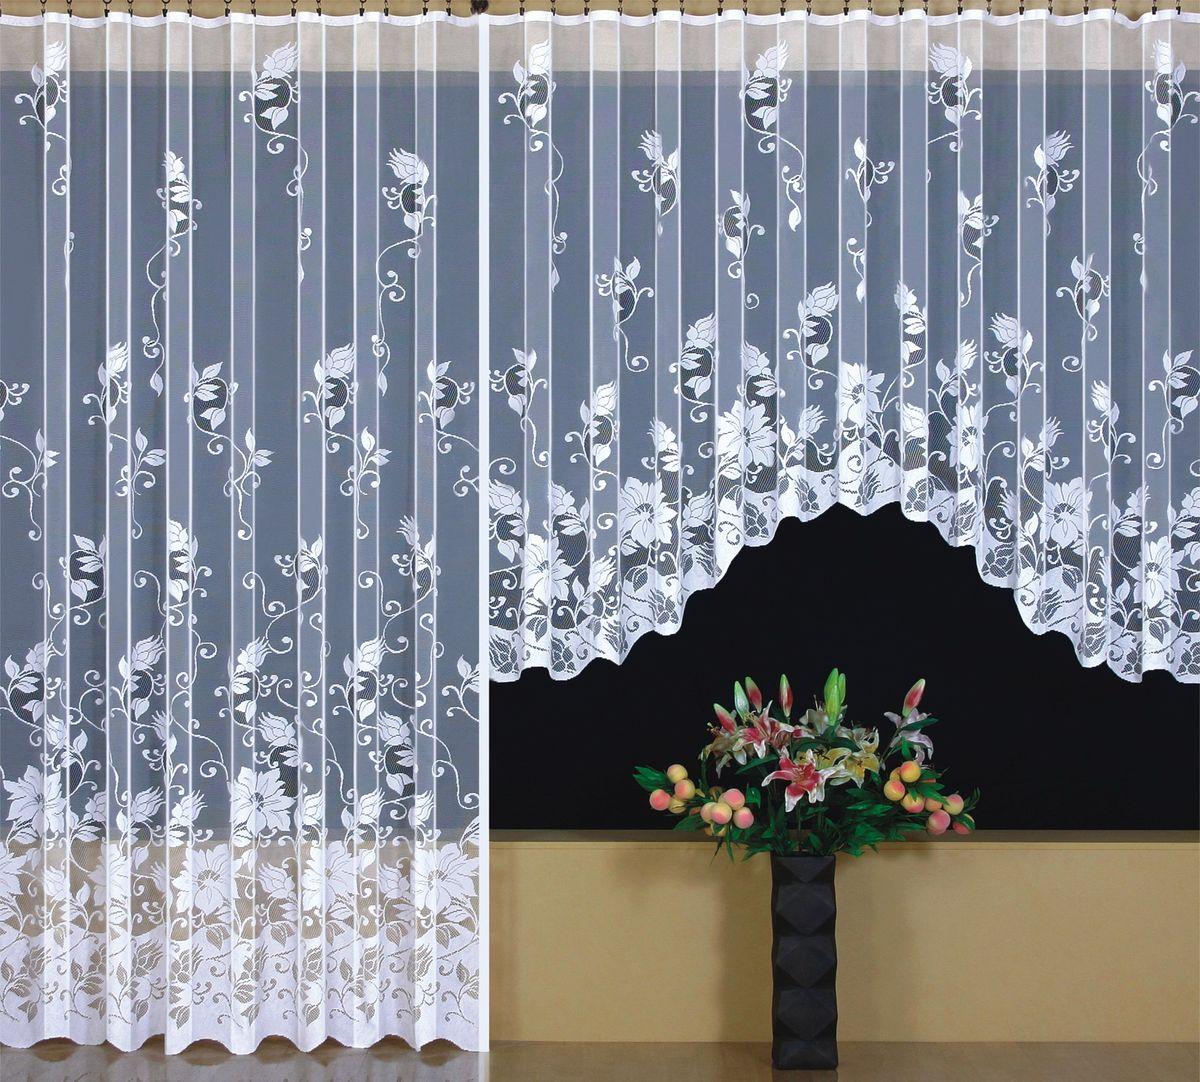 Комплект гардин для балк.двери WISAN 300*160+200*250. 9415+94139415+9413Комплект гардин для балк.двери WISAN 300*160+200*250. 9415+9413 Материал: 100% п/э, размер: 300*160+200*250, цвет: белый